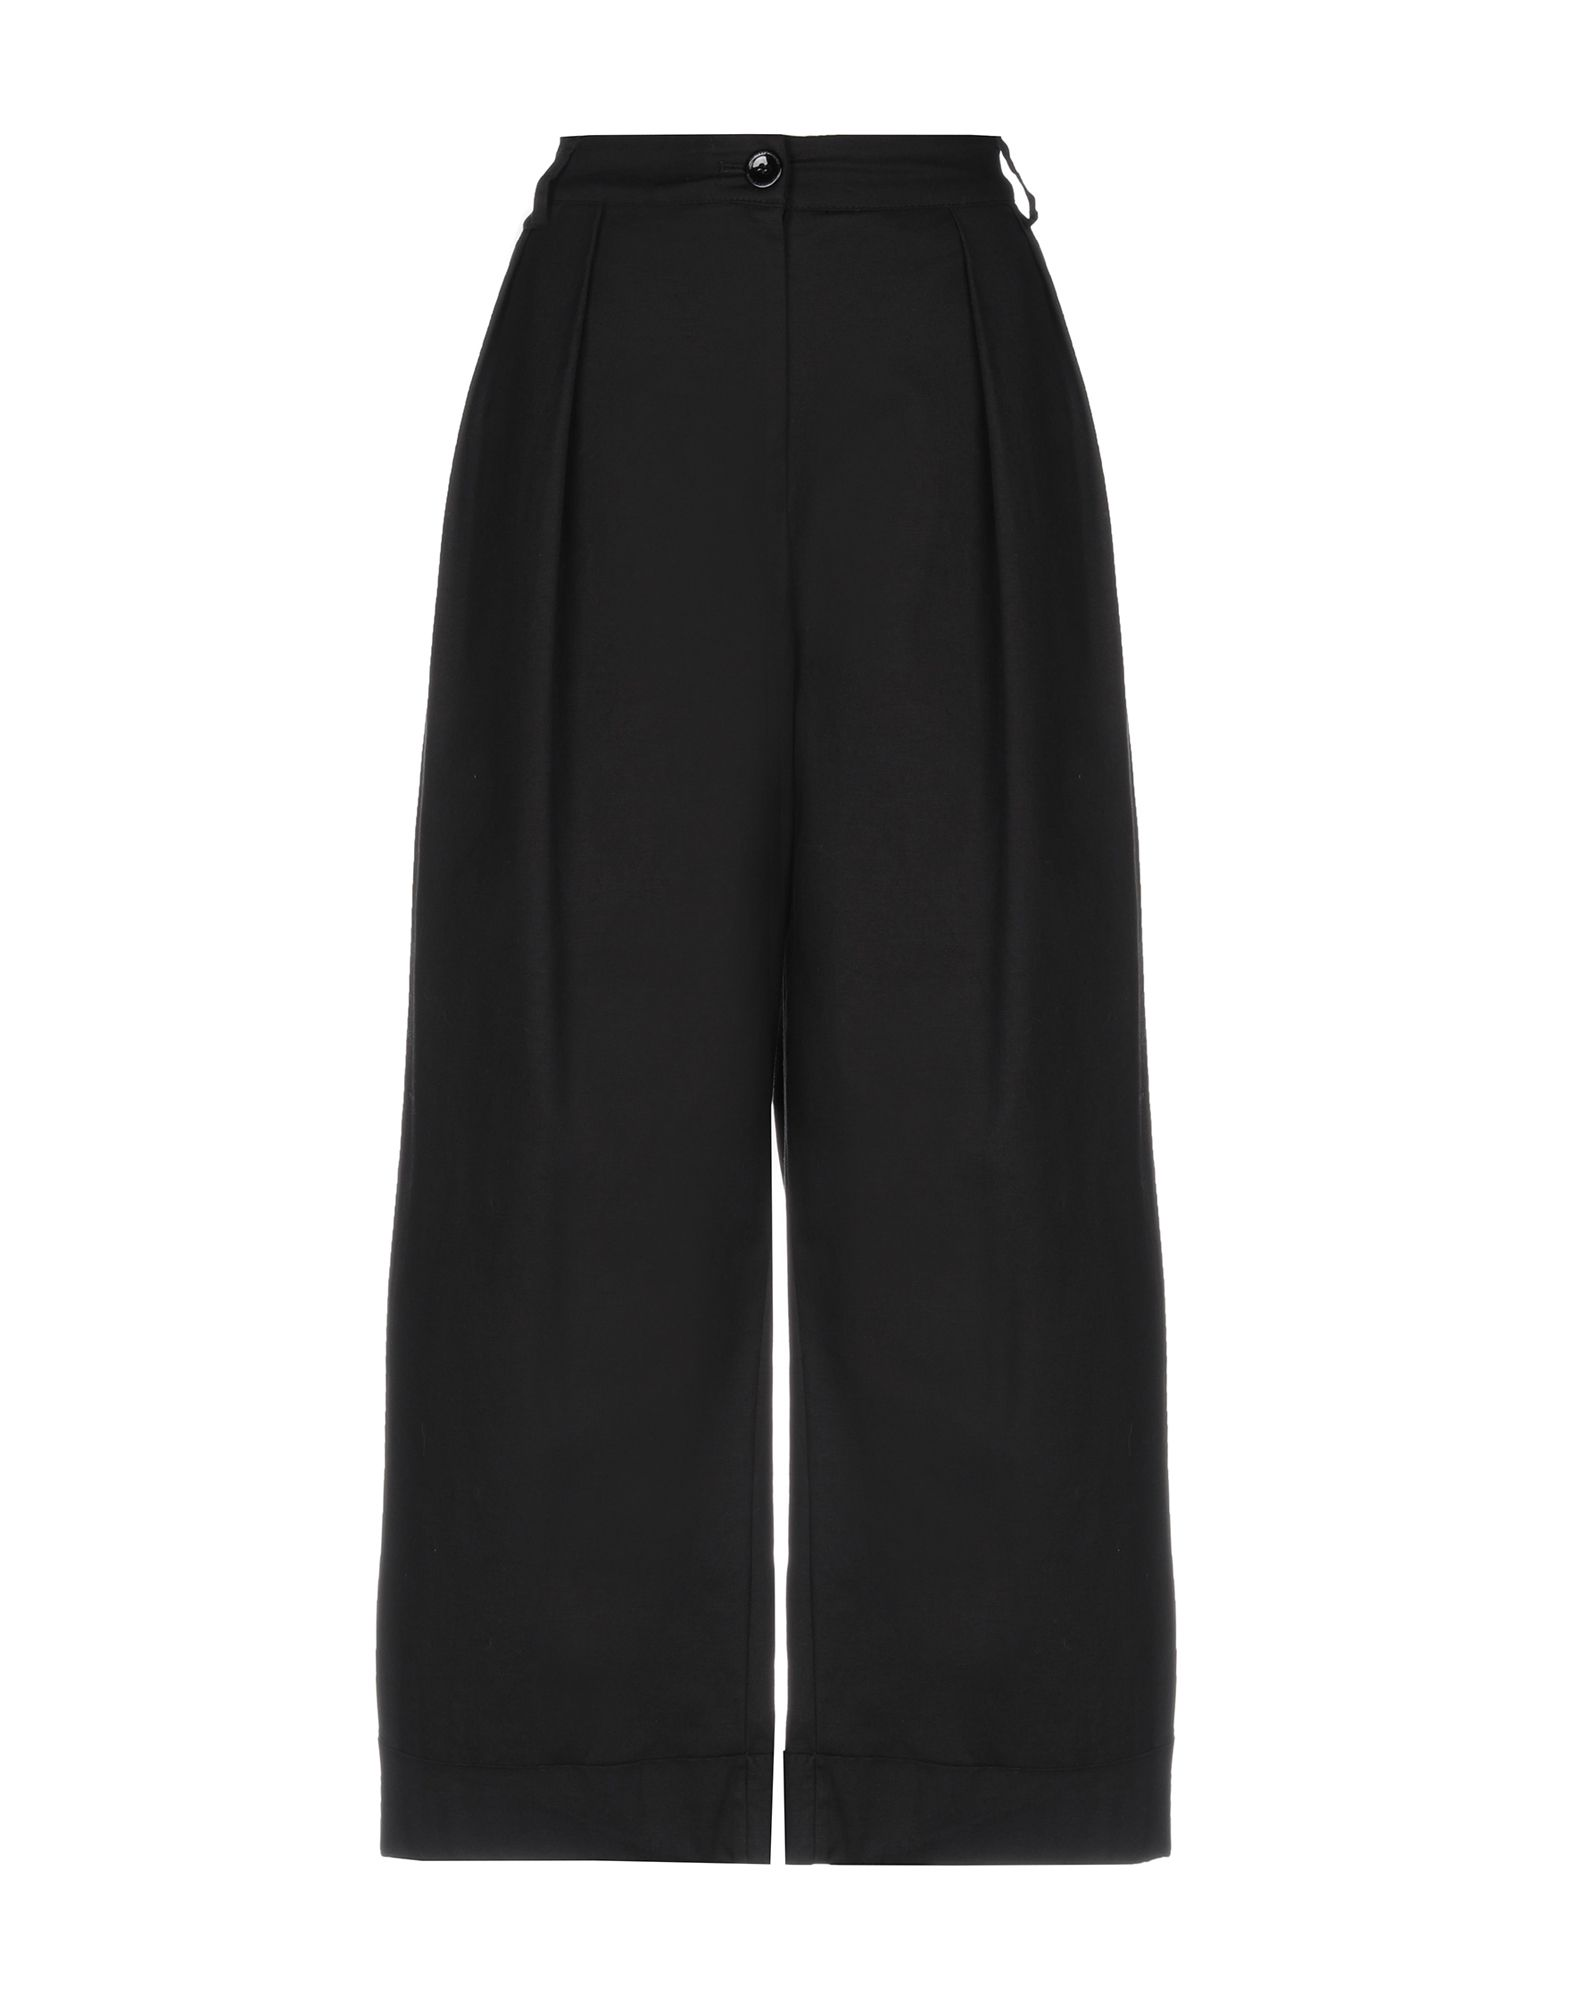 Pantalone Paolo Casalini Casalini donna - 13240972CF  ohne zu zögern! jetzt kaufen!